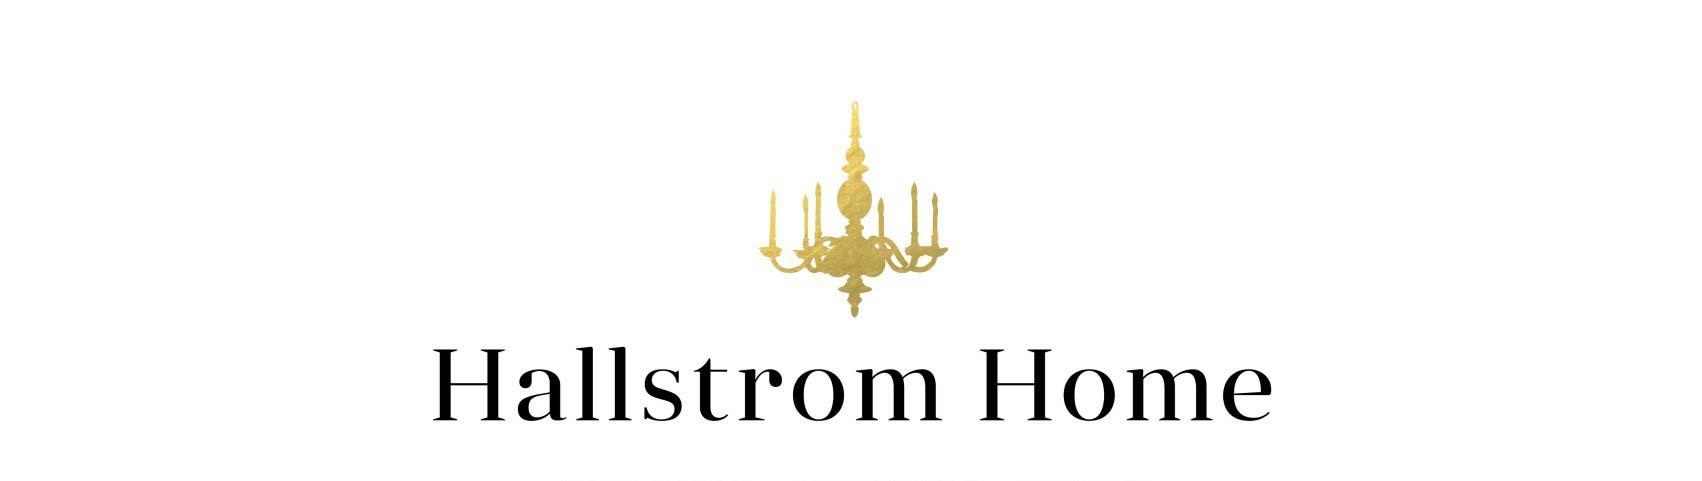 Hallstrom Home